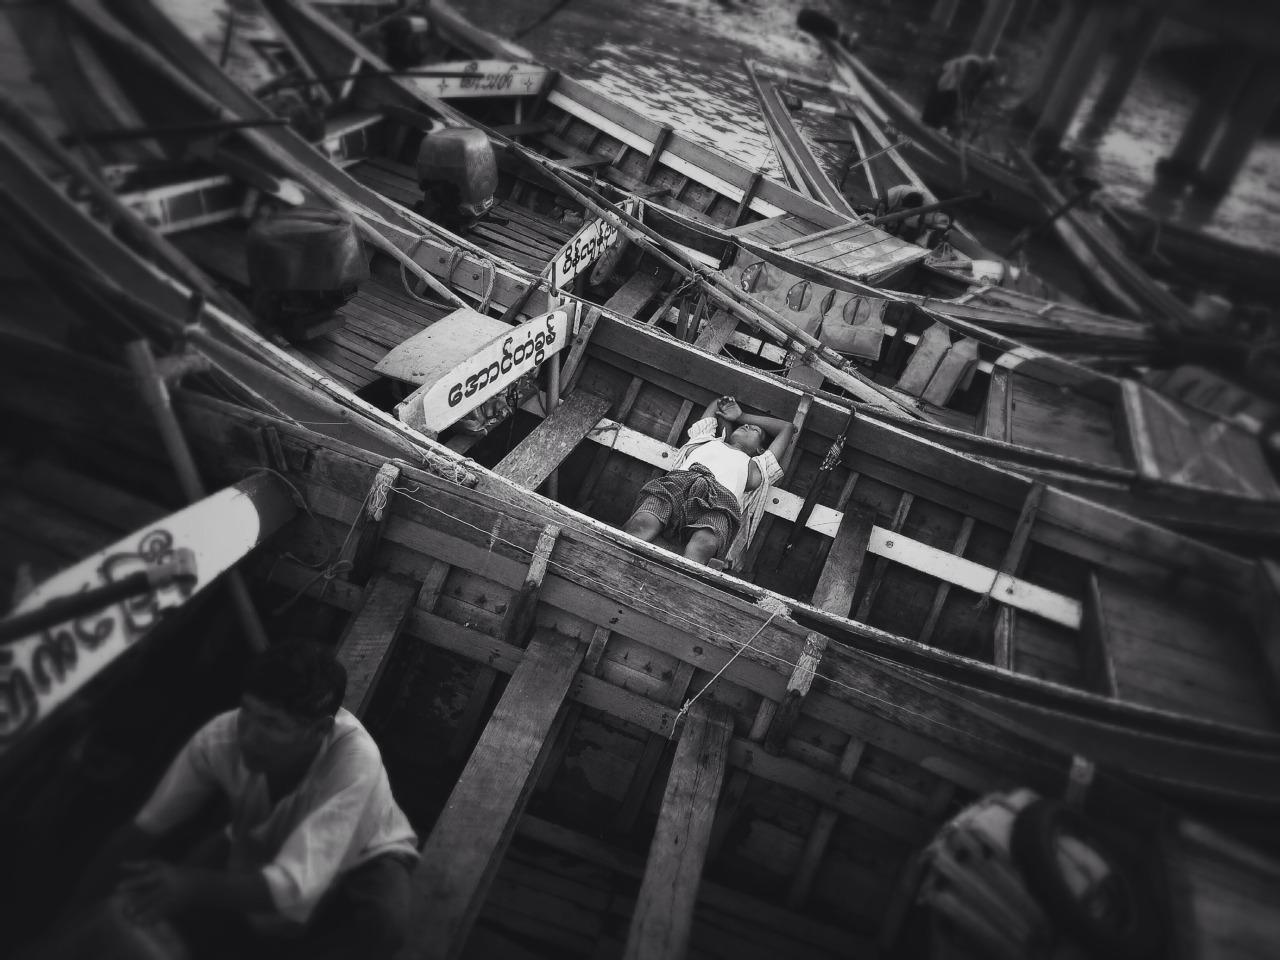 Life of Ferry Boats Yangon, MMR. 2015 © Thet Paing Htay